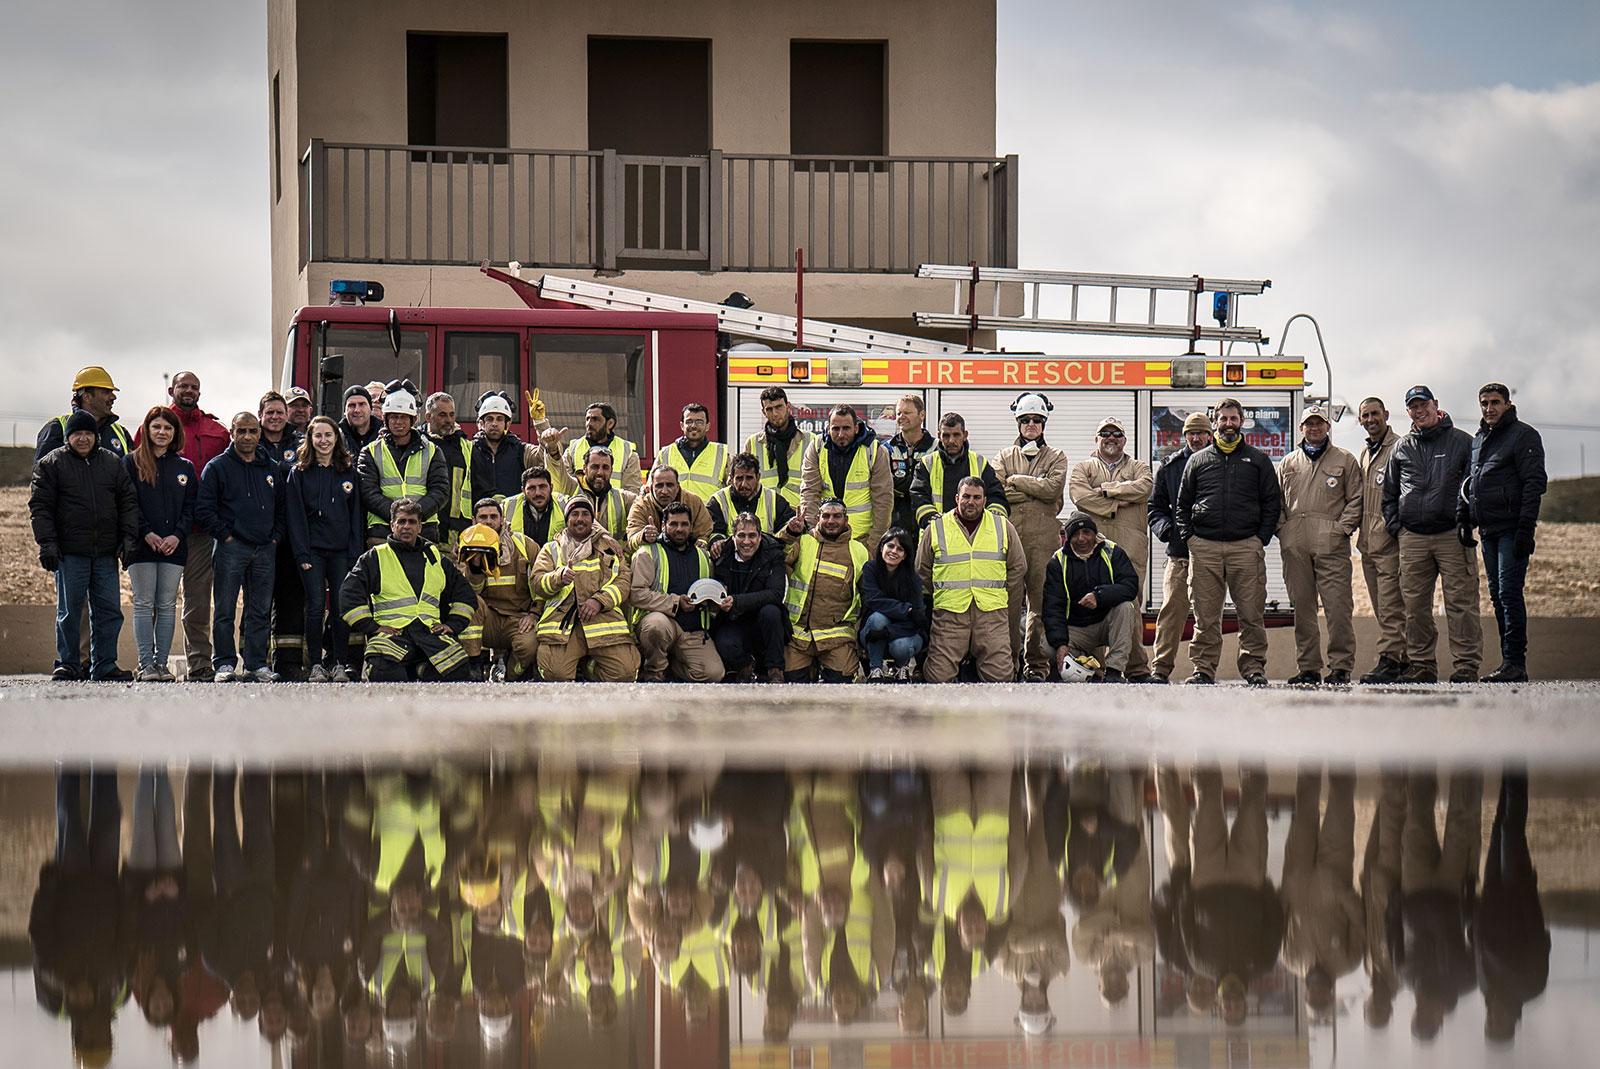 Fire training for the White Helmets